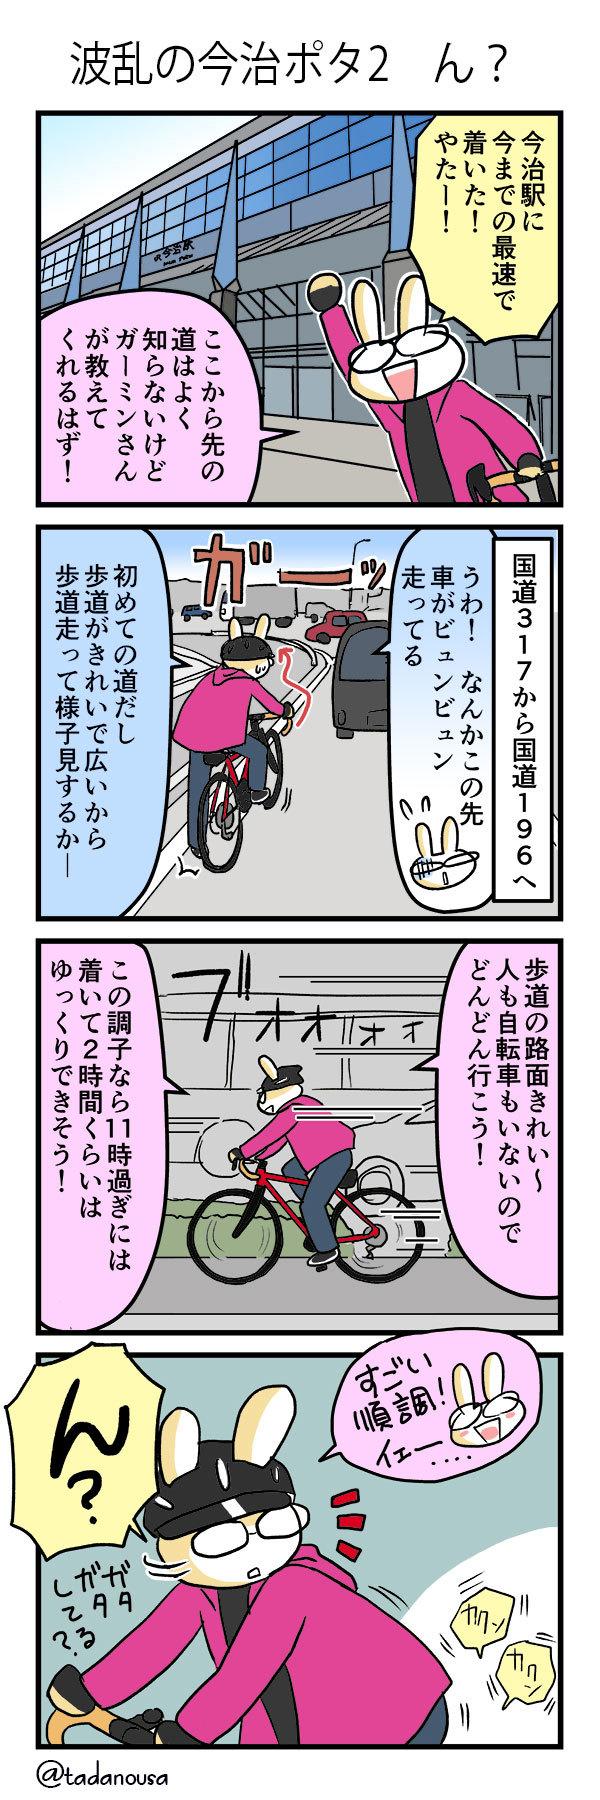 bike_4koma_RB20200223_02_s.jpg